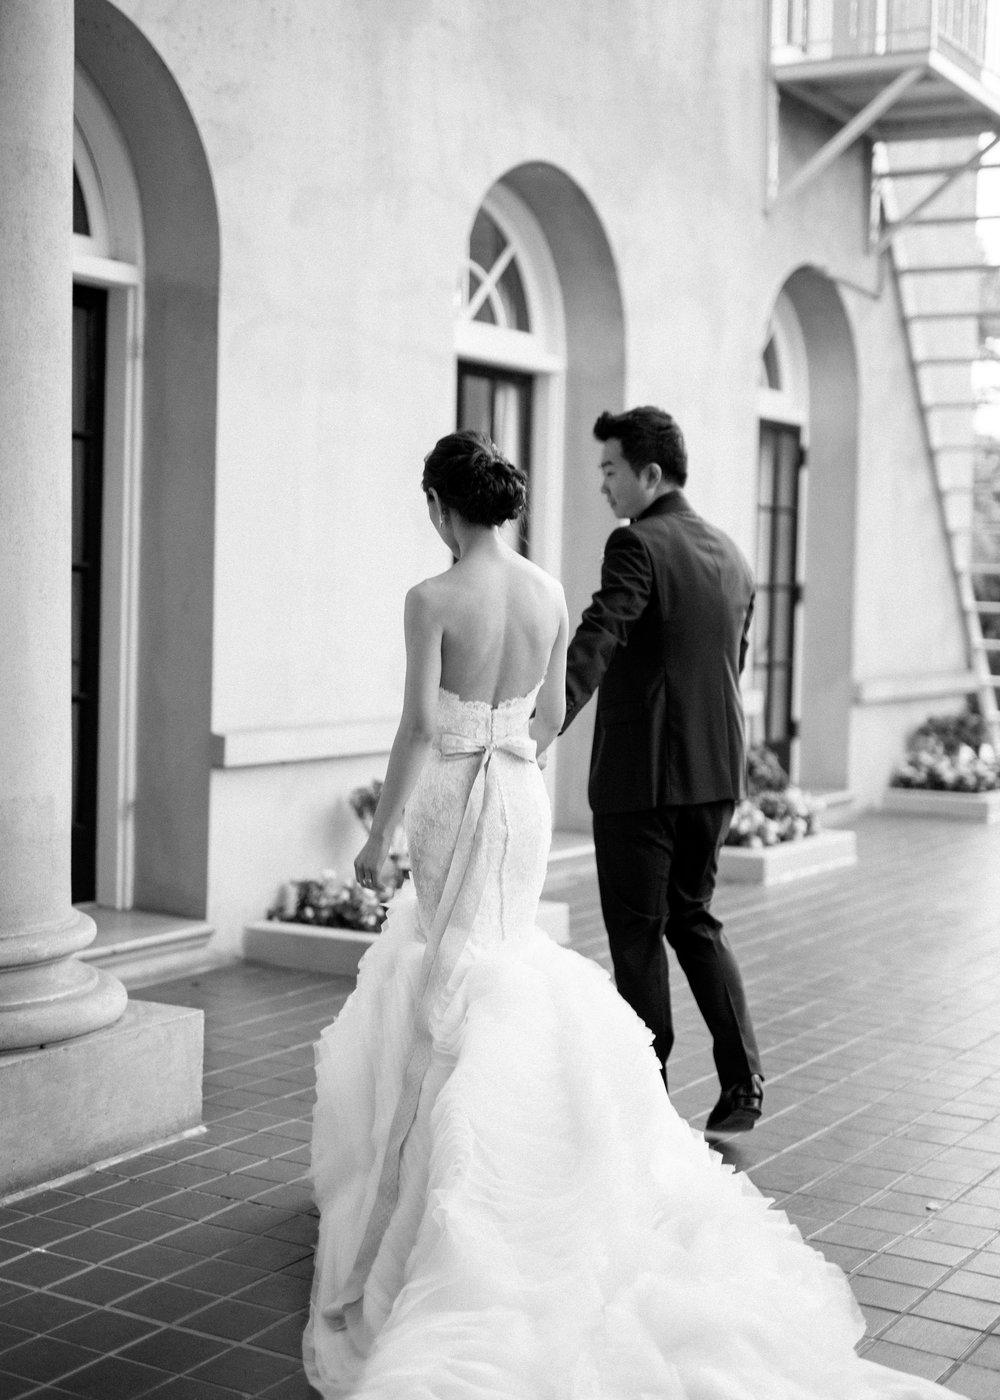 herafilms_wedding_sara_lei_hera_selects-45.jpg